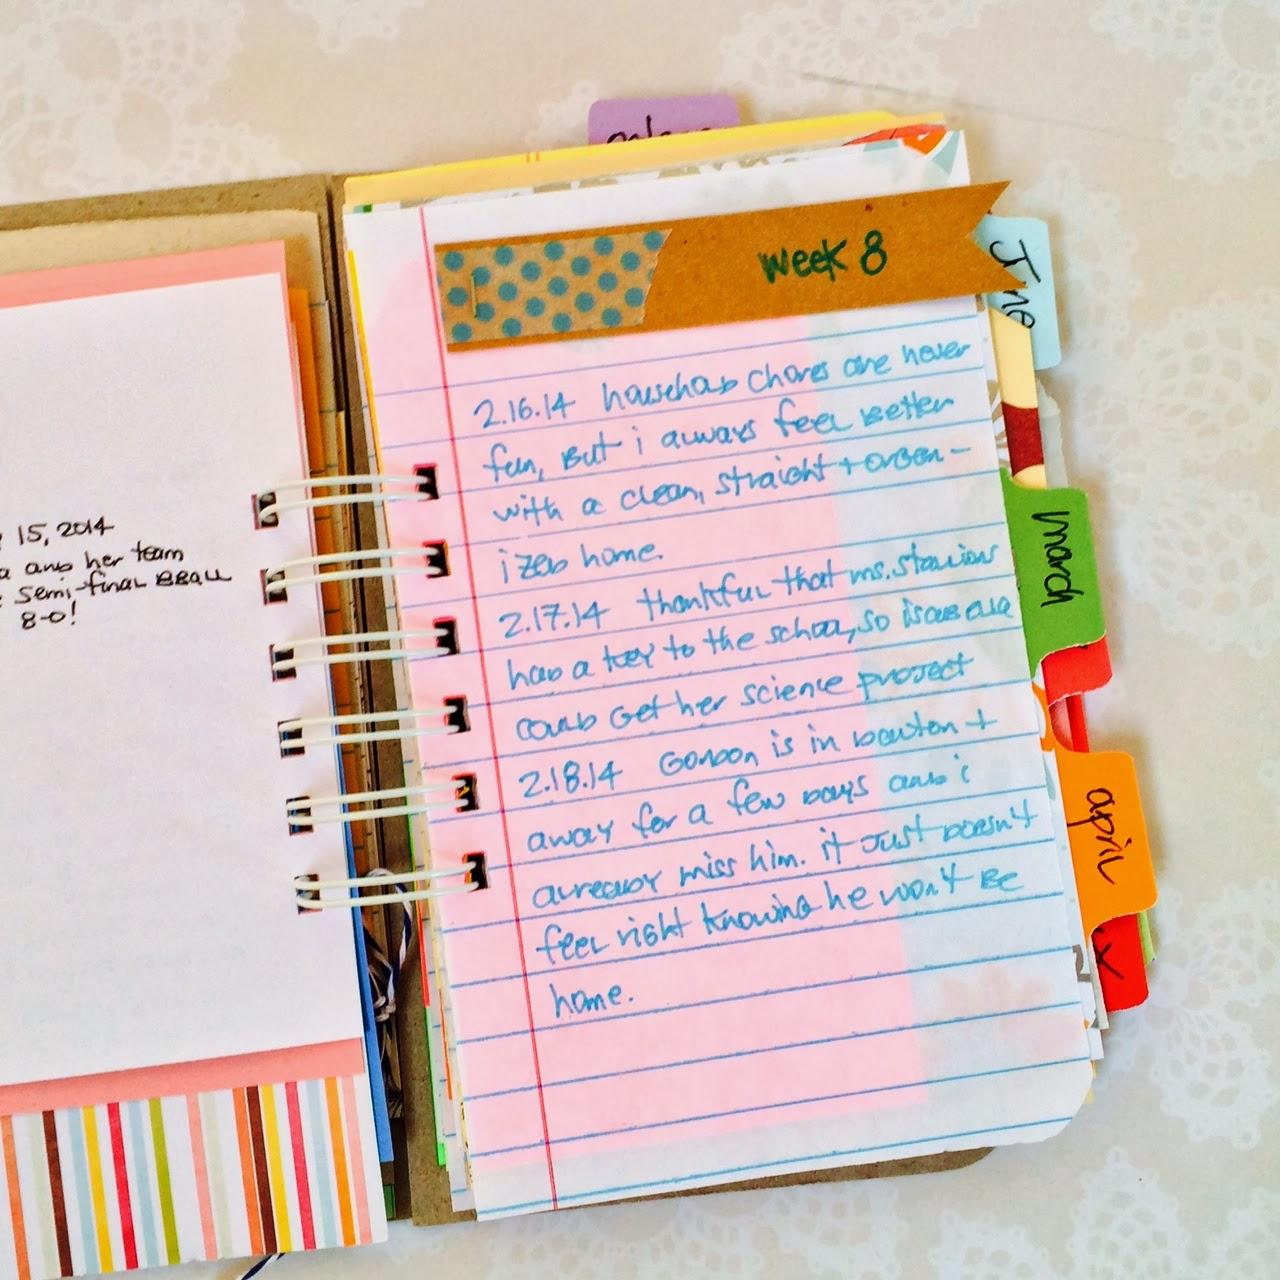 #gratitude #journal #gratitudejournal #scrapbooking #minialbum #minibook